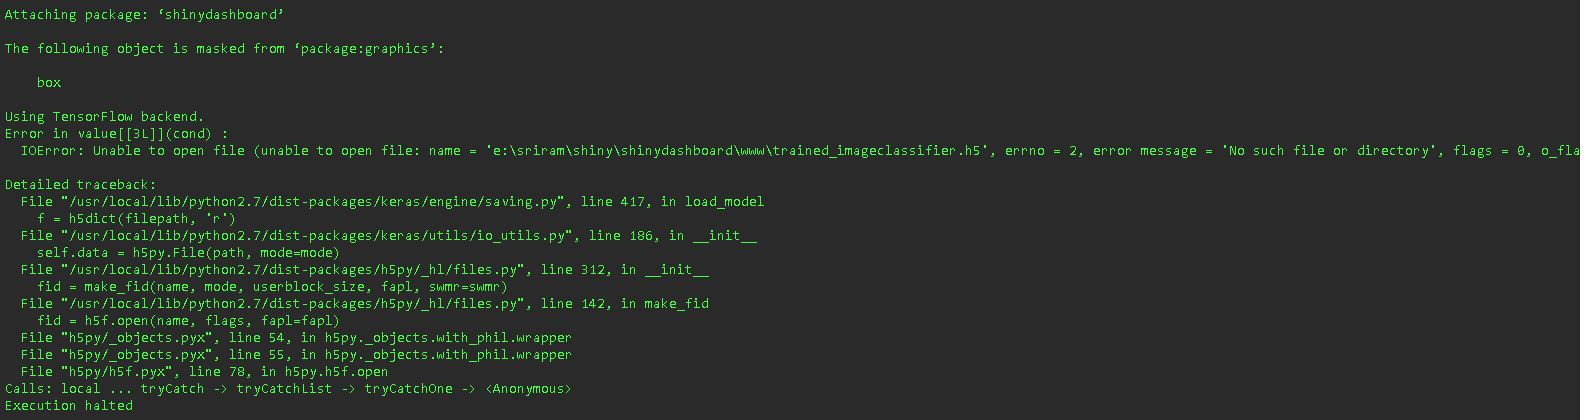 Error when starting Shiny App with keras model - shiny - RStudio